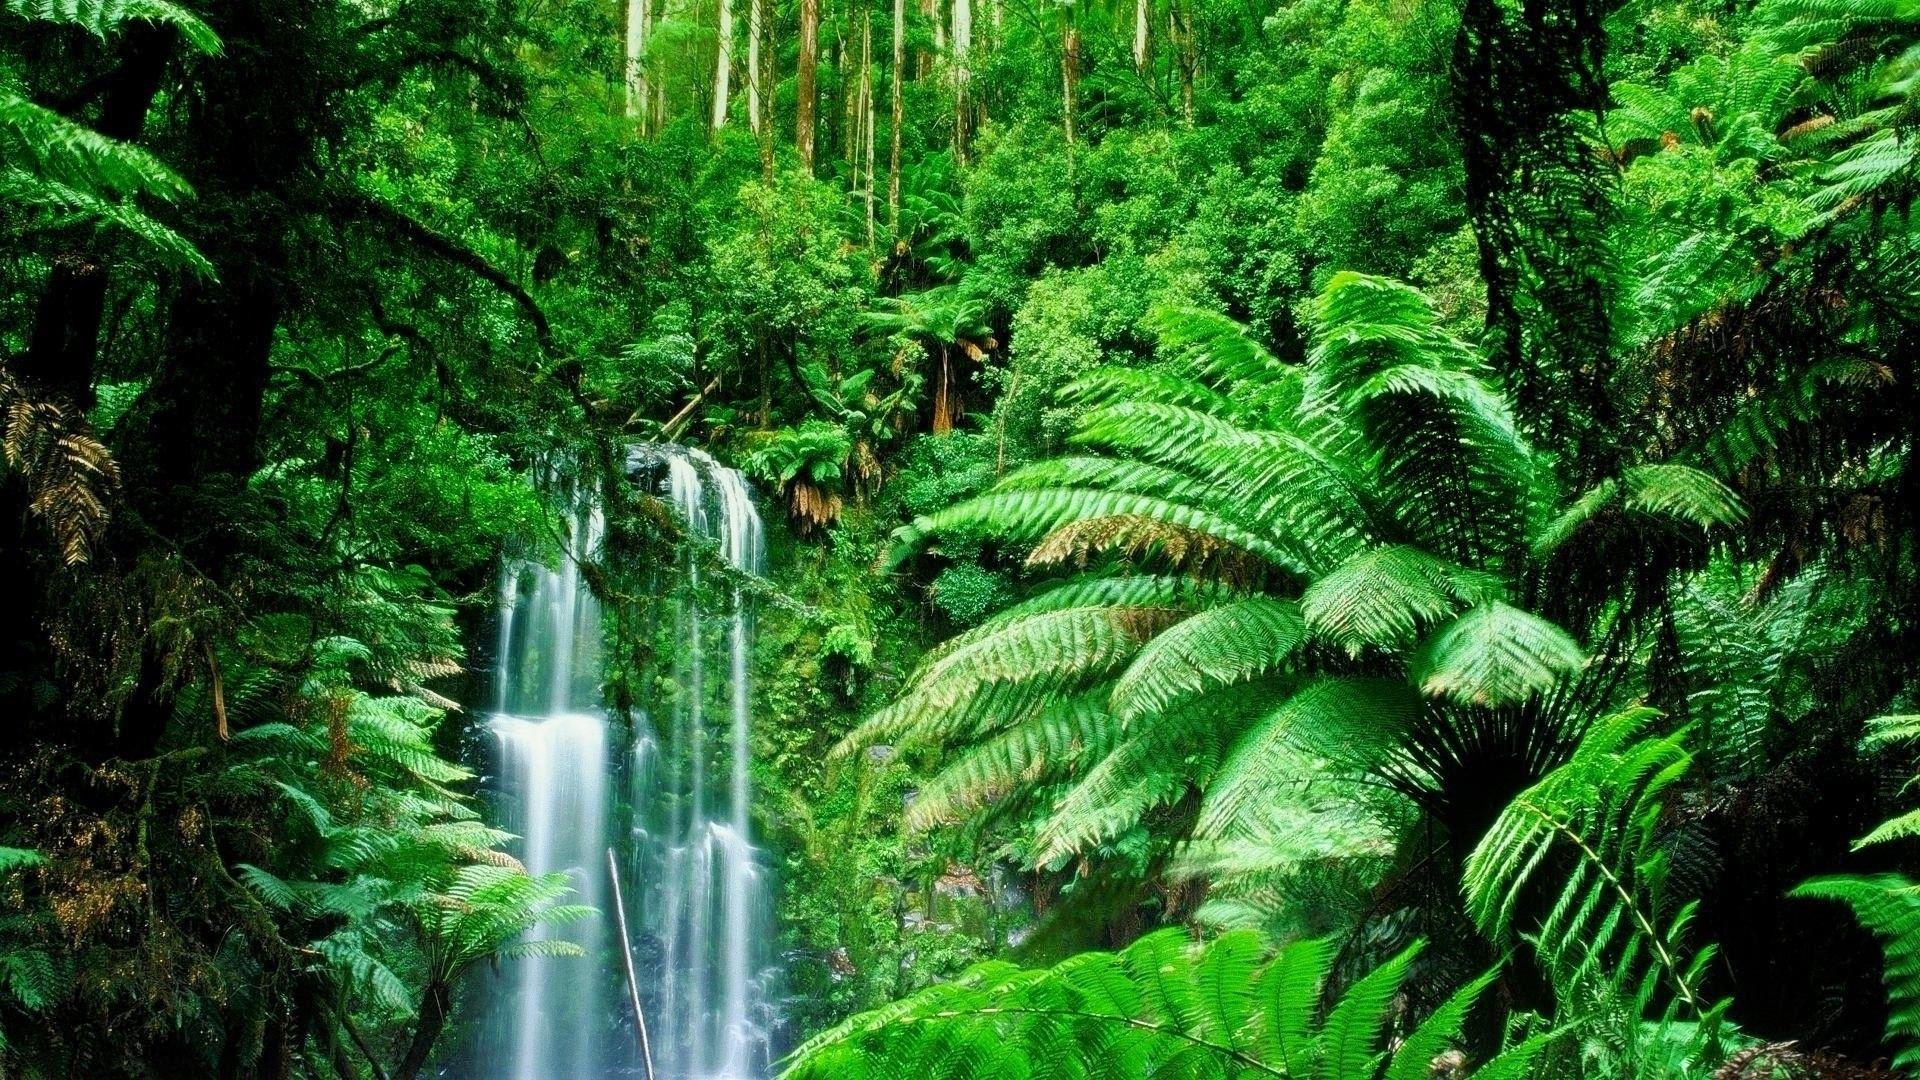 Amazon Rainforest Feel The Rainfall Of Leaves